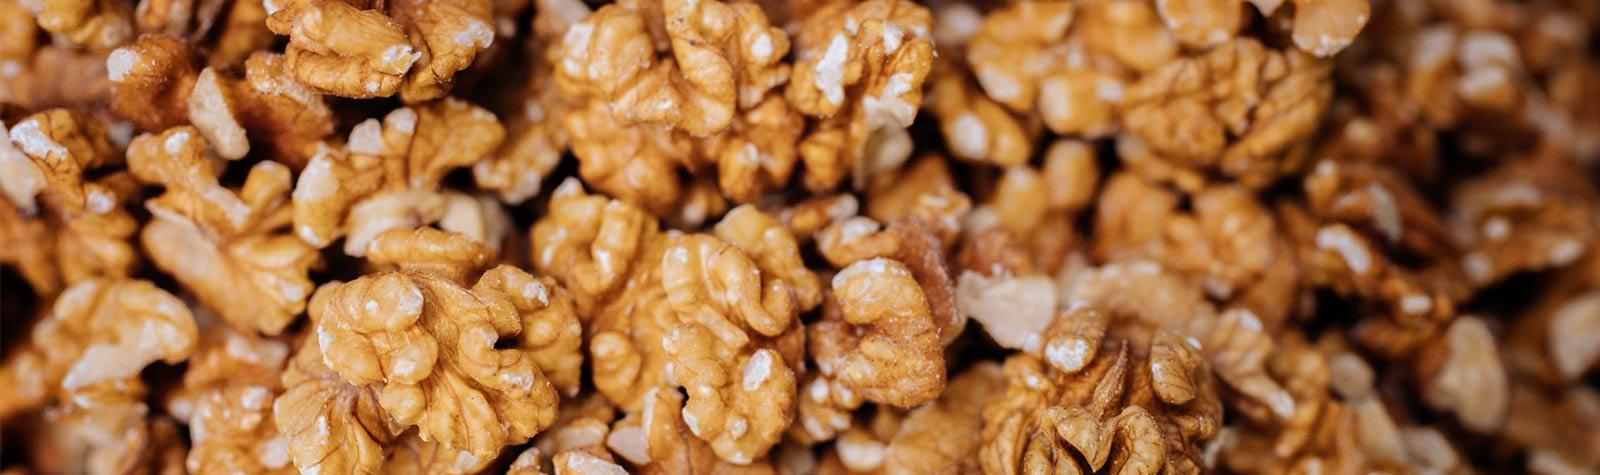 Frutos secos: comida sana para deportistas